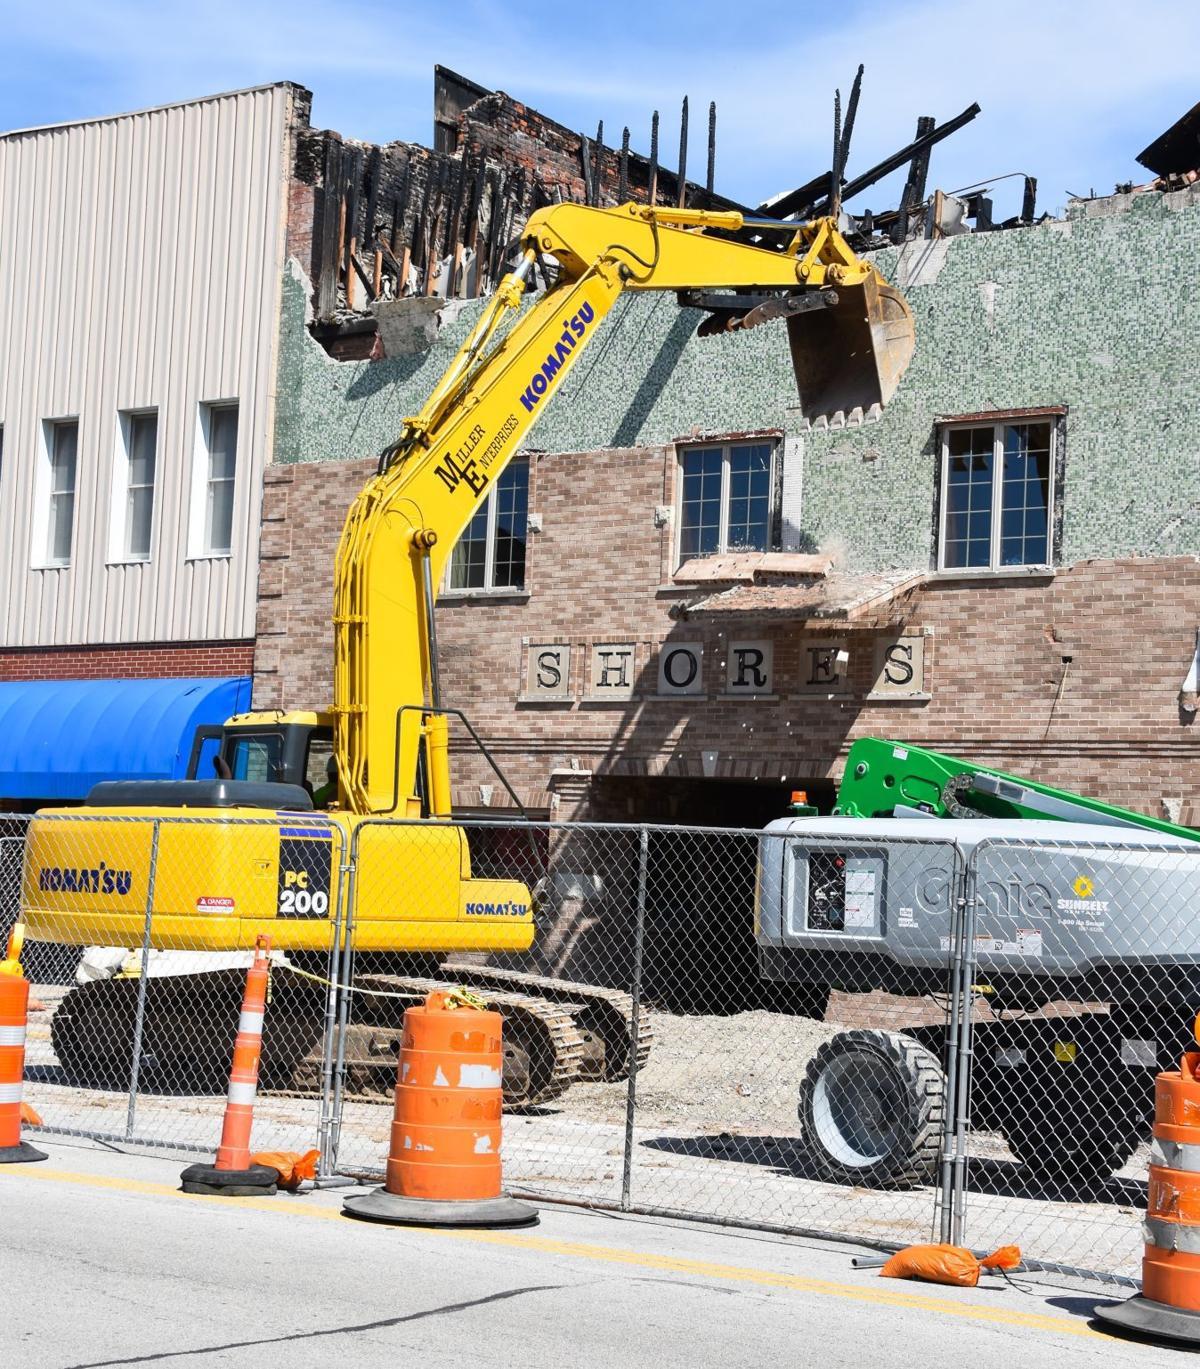 Shores Jewelry building demolition begins in Mattoon